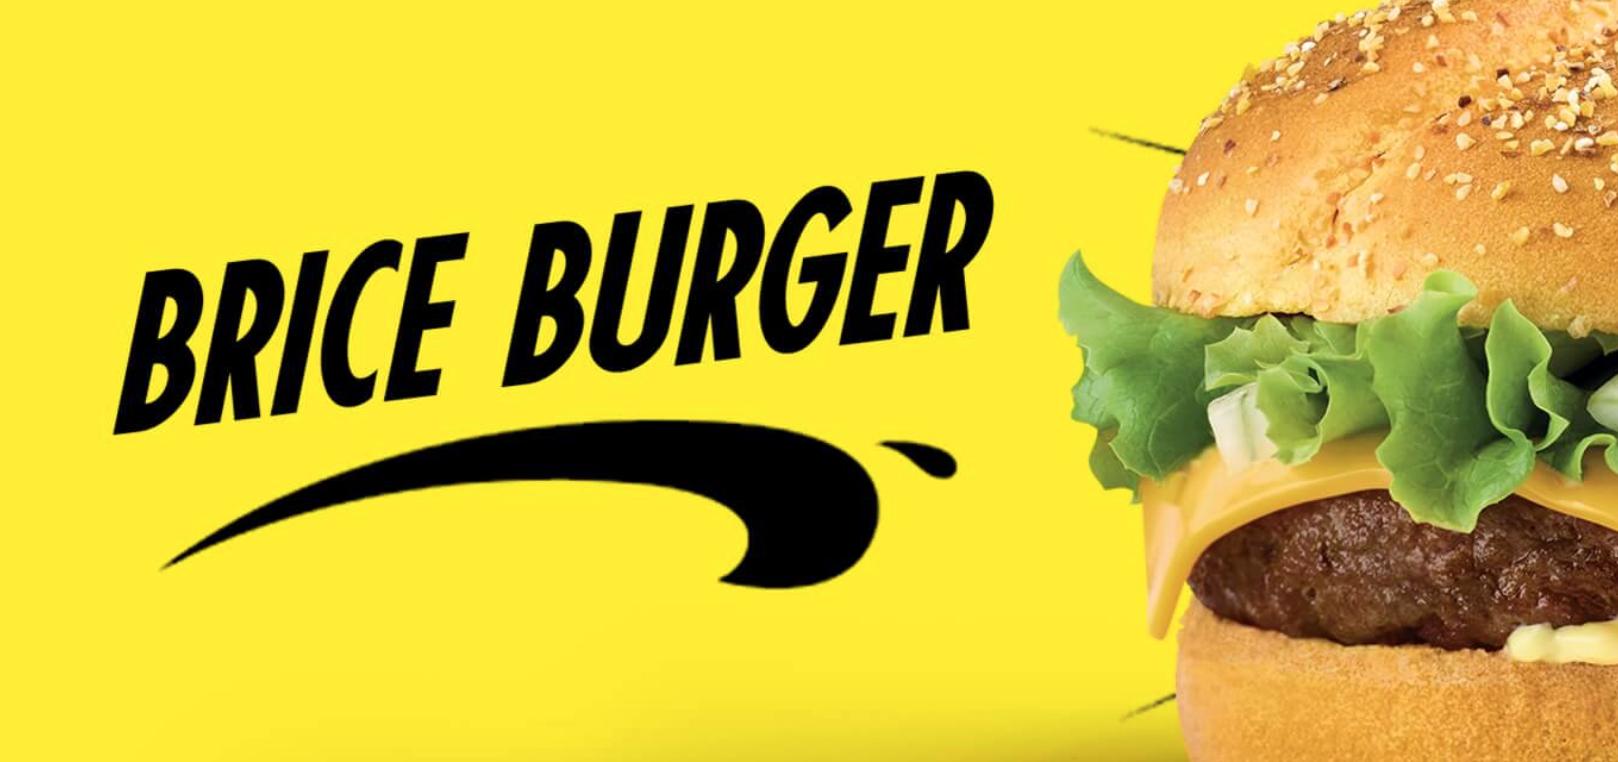 Quick lance un menu Brice de Nice avec un burger jaune